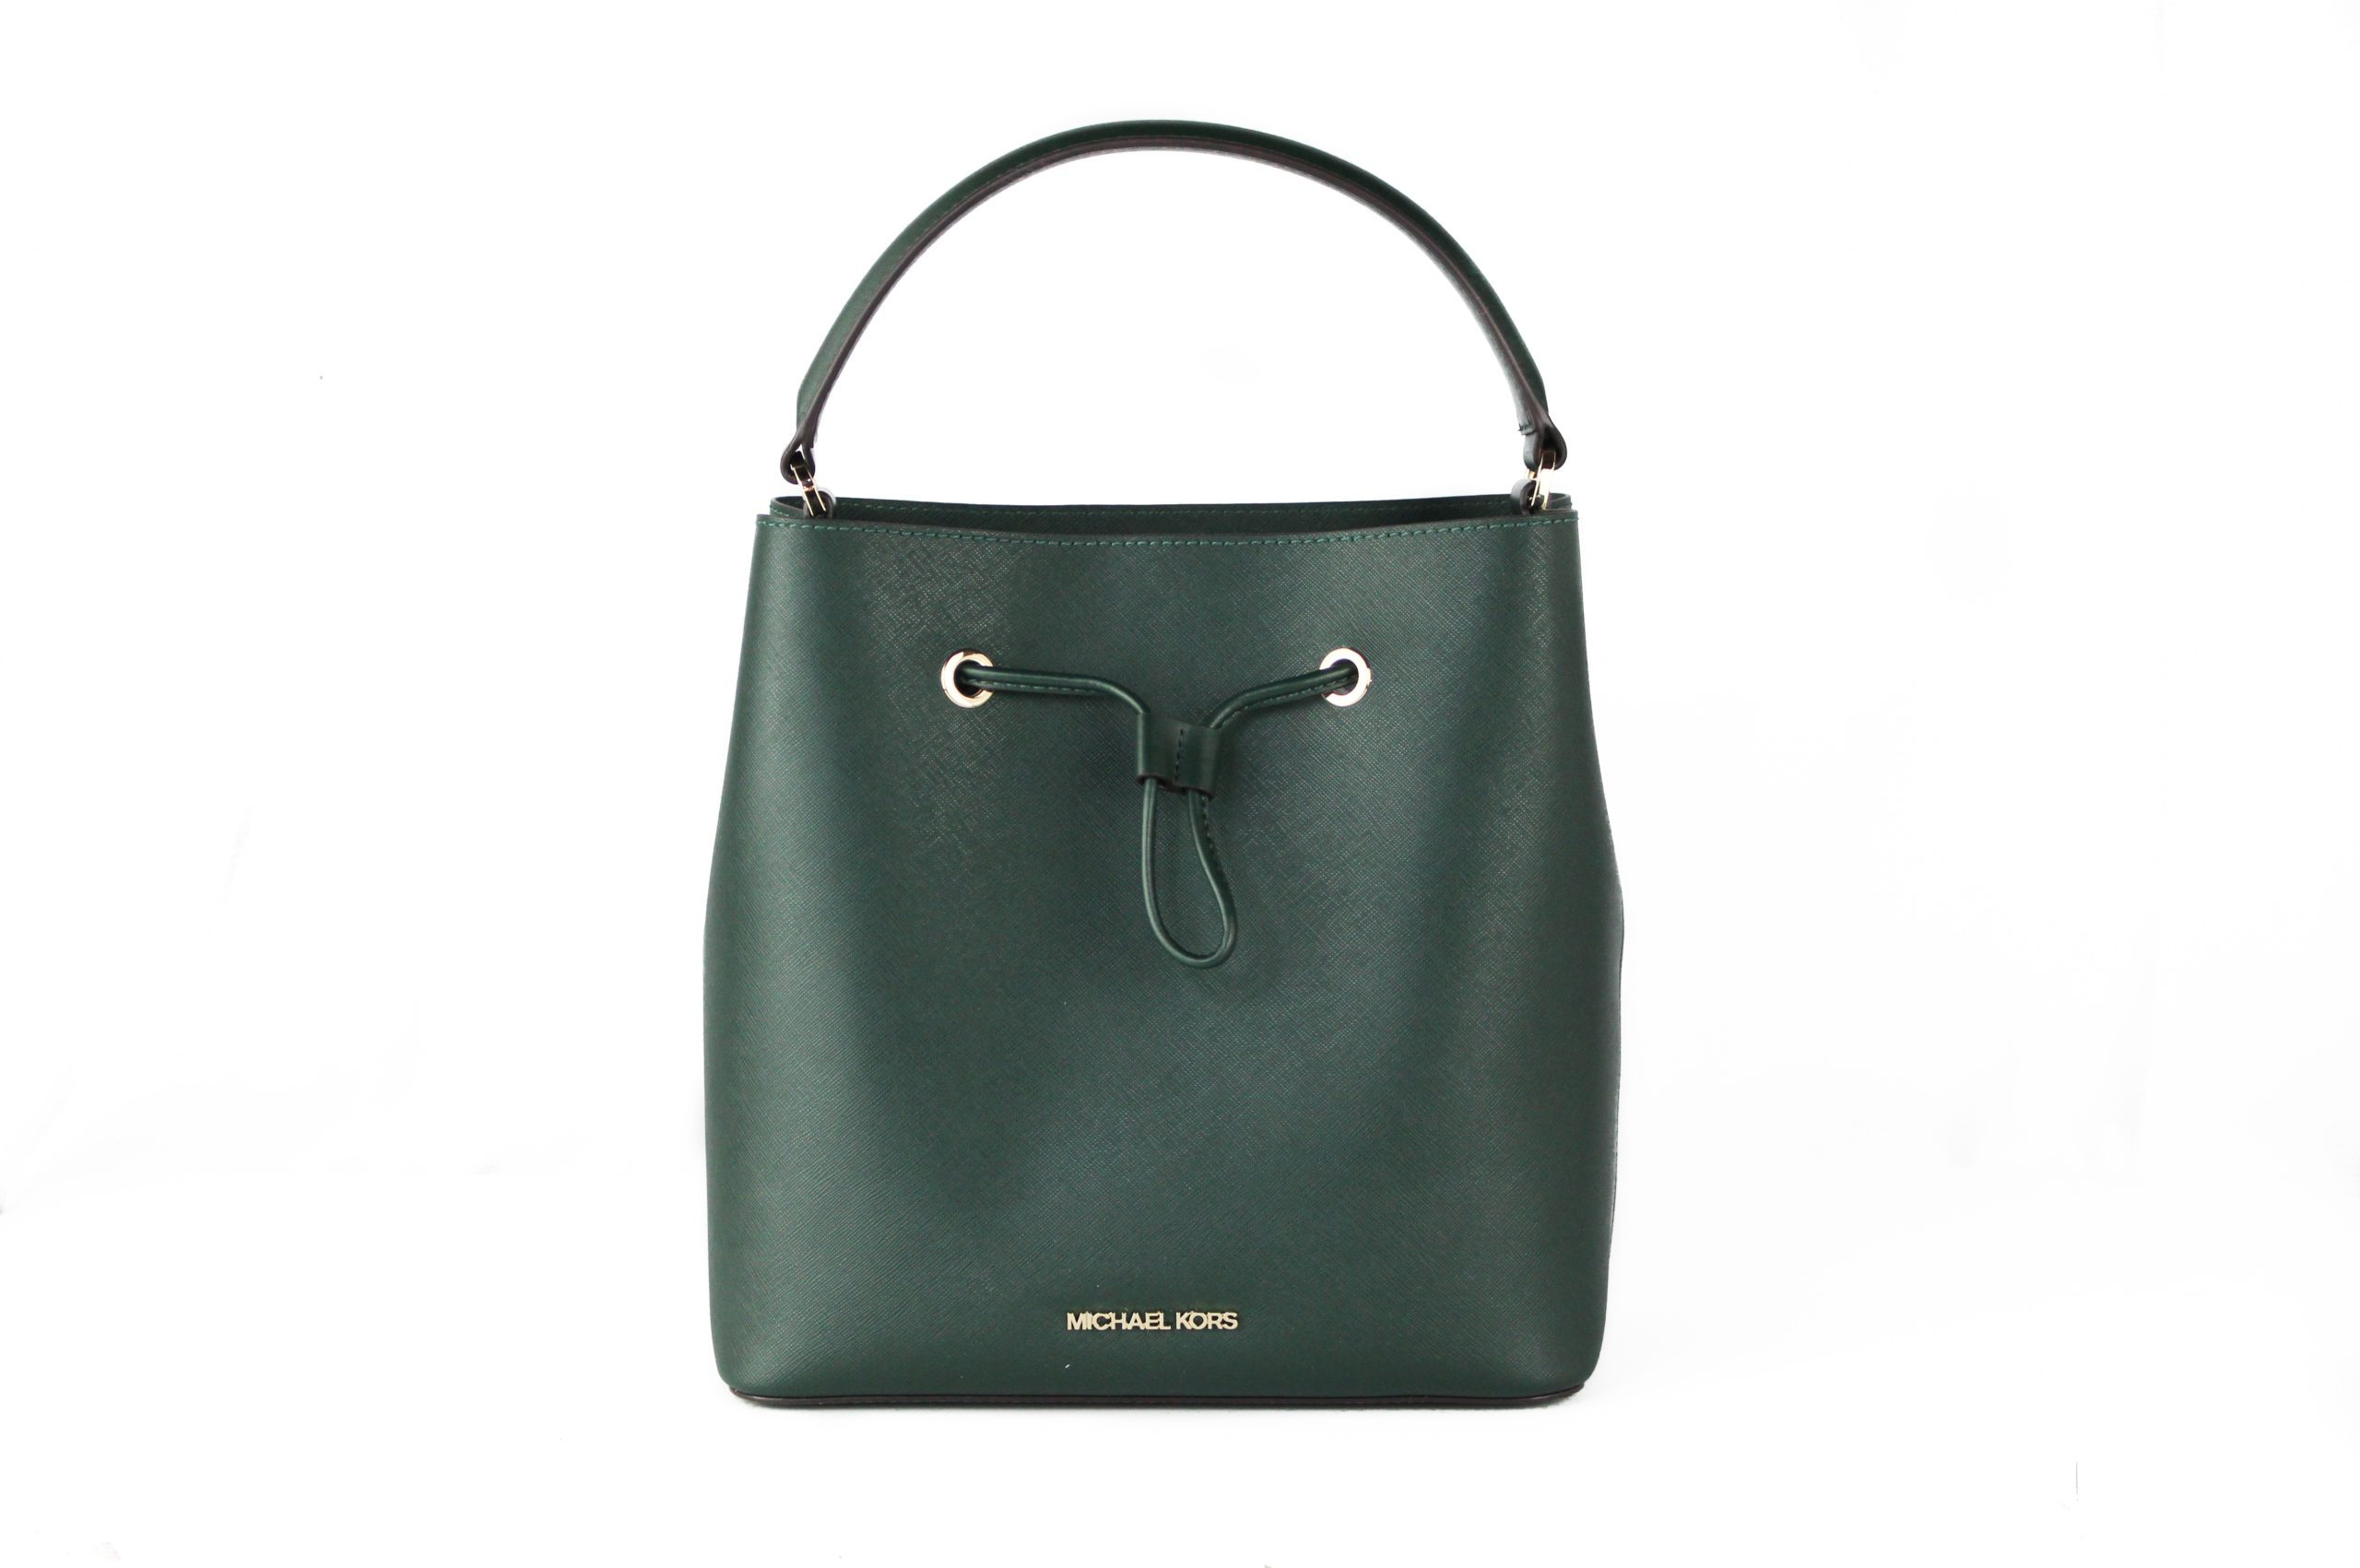 Michael Kors Women's Suri Large Leather Bucket Crossbody Bag Green 35481